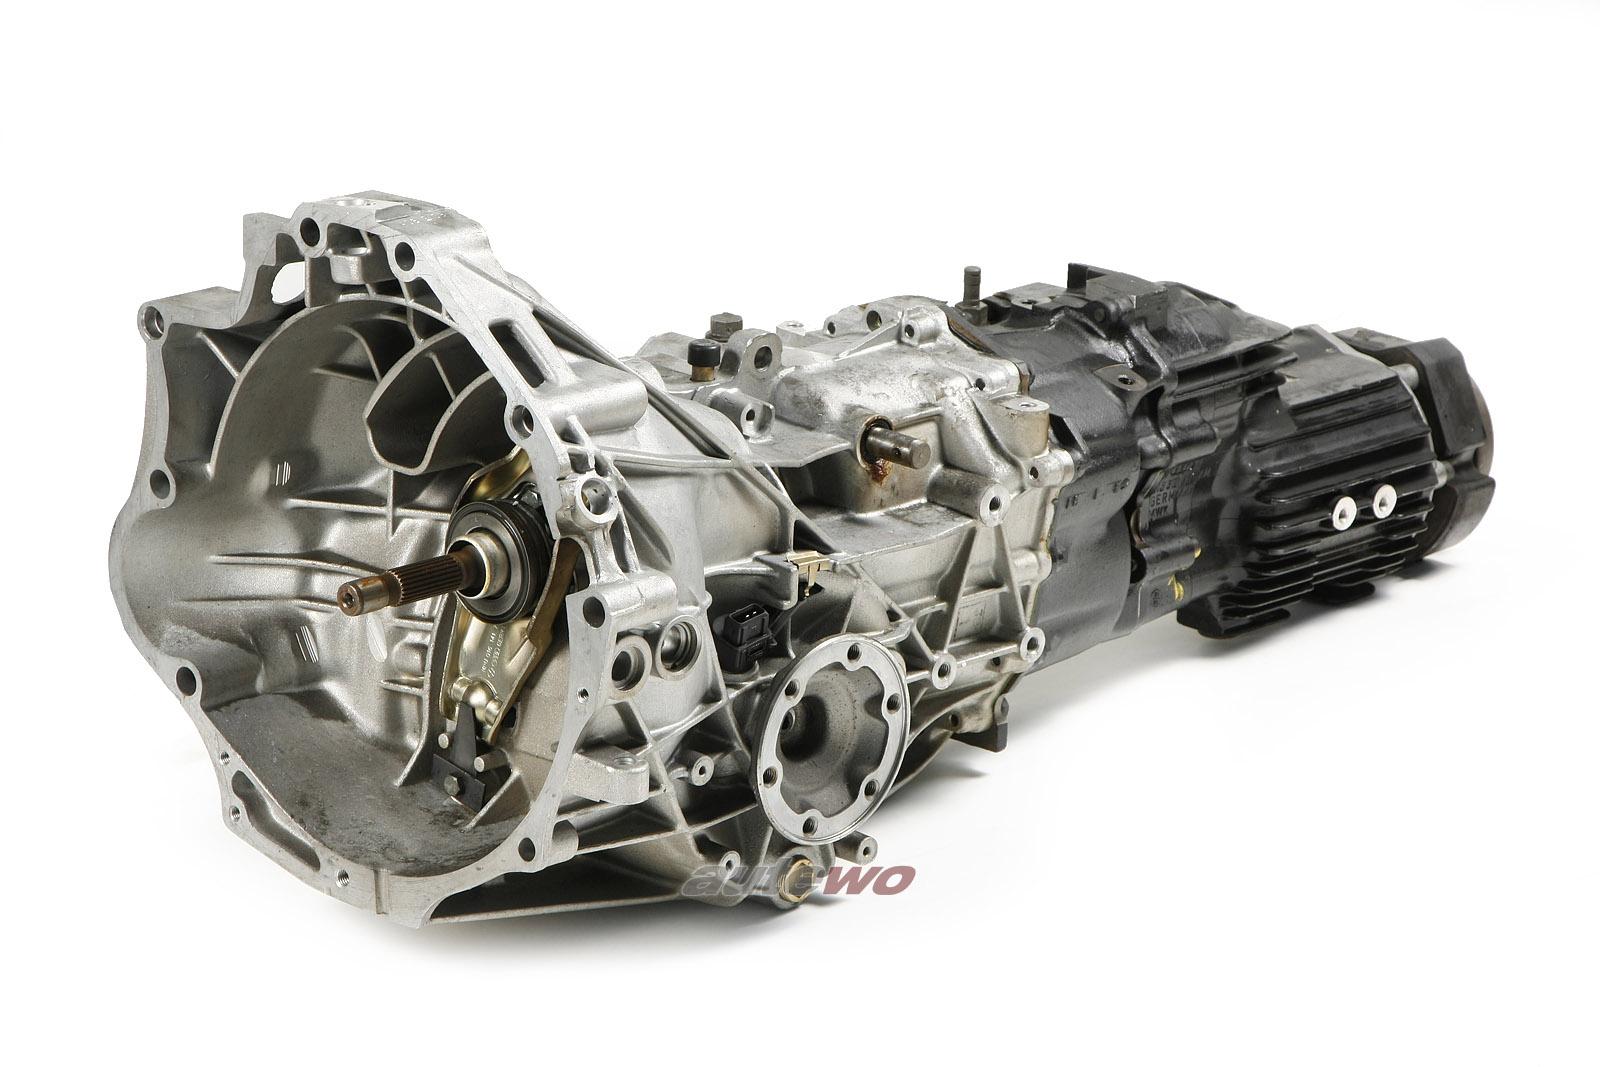 016300051T NEU Audi 100/200 Typ 44 2.2l 5-Gang-Getriebe Quattro AOB 21051